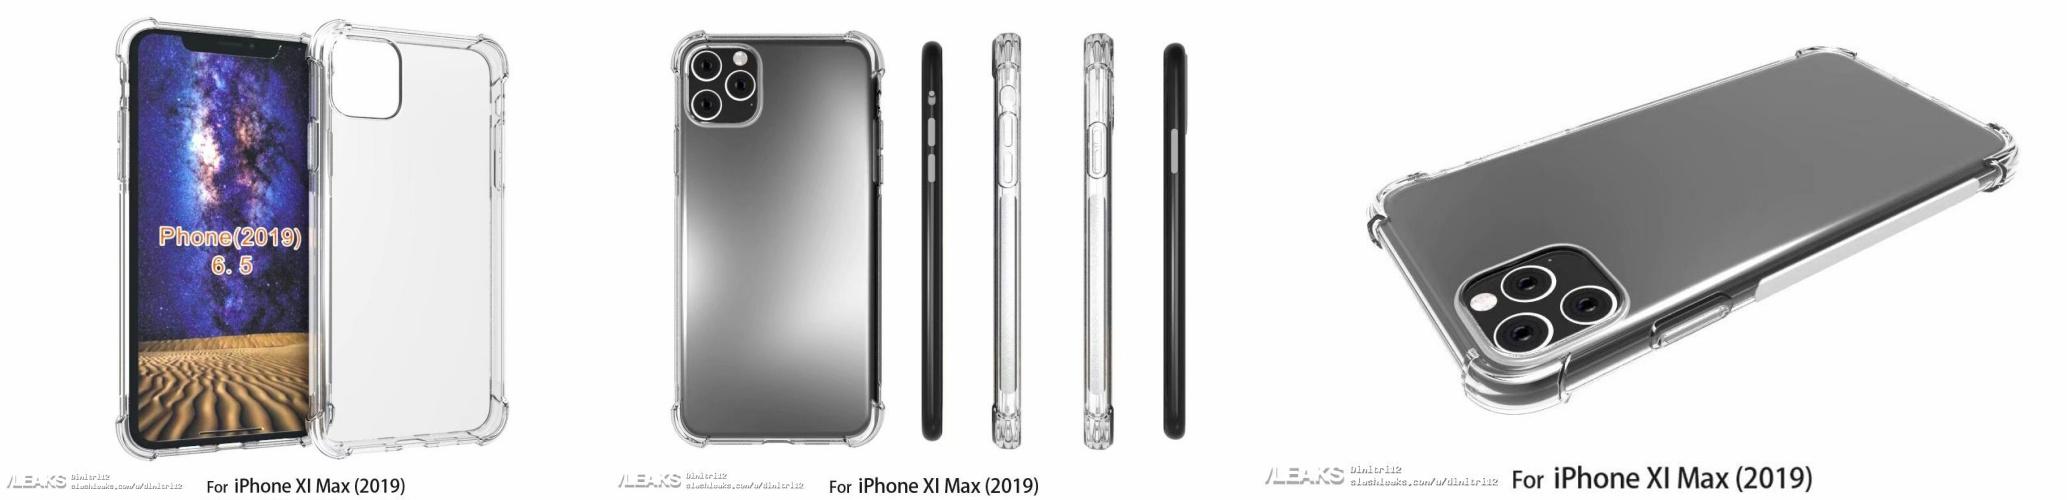 iPhone 11 carcasa 11 max